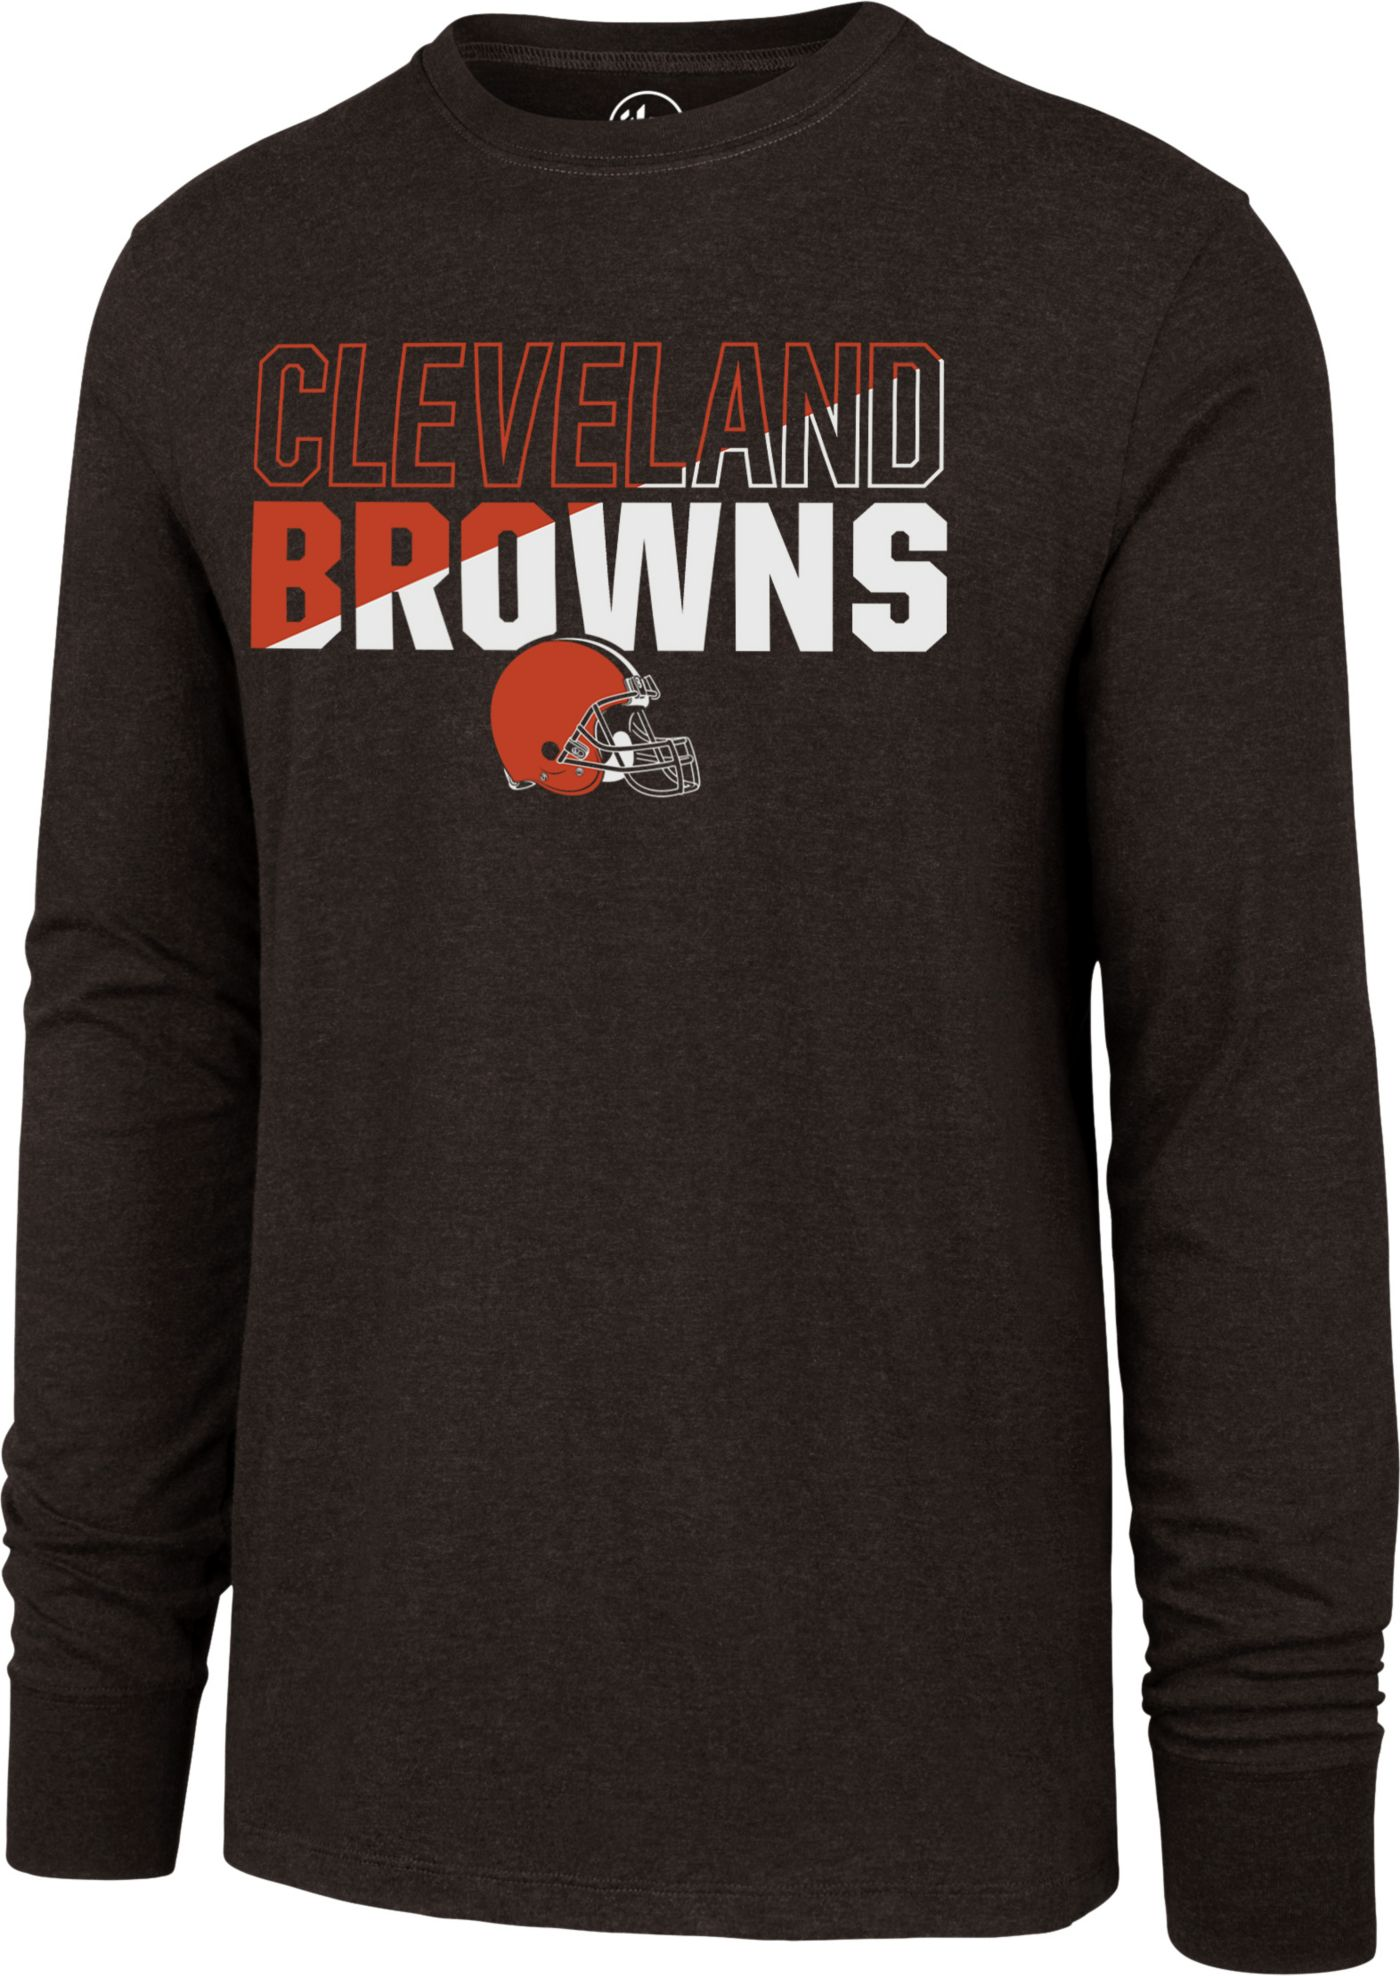 '47 Men's Cleveland Browns Club Long Sleeve Brown Shirt